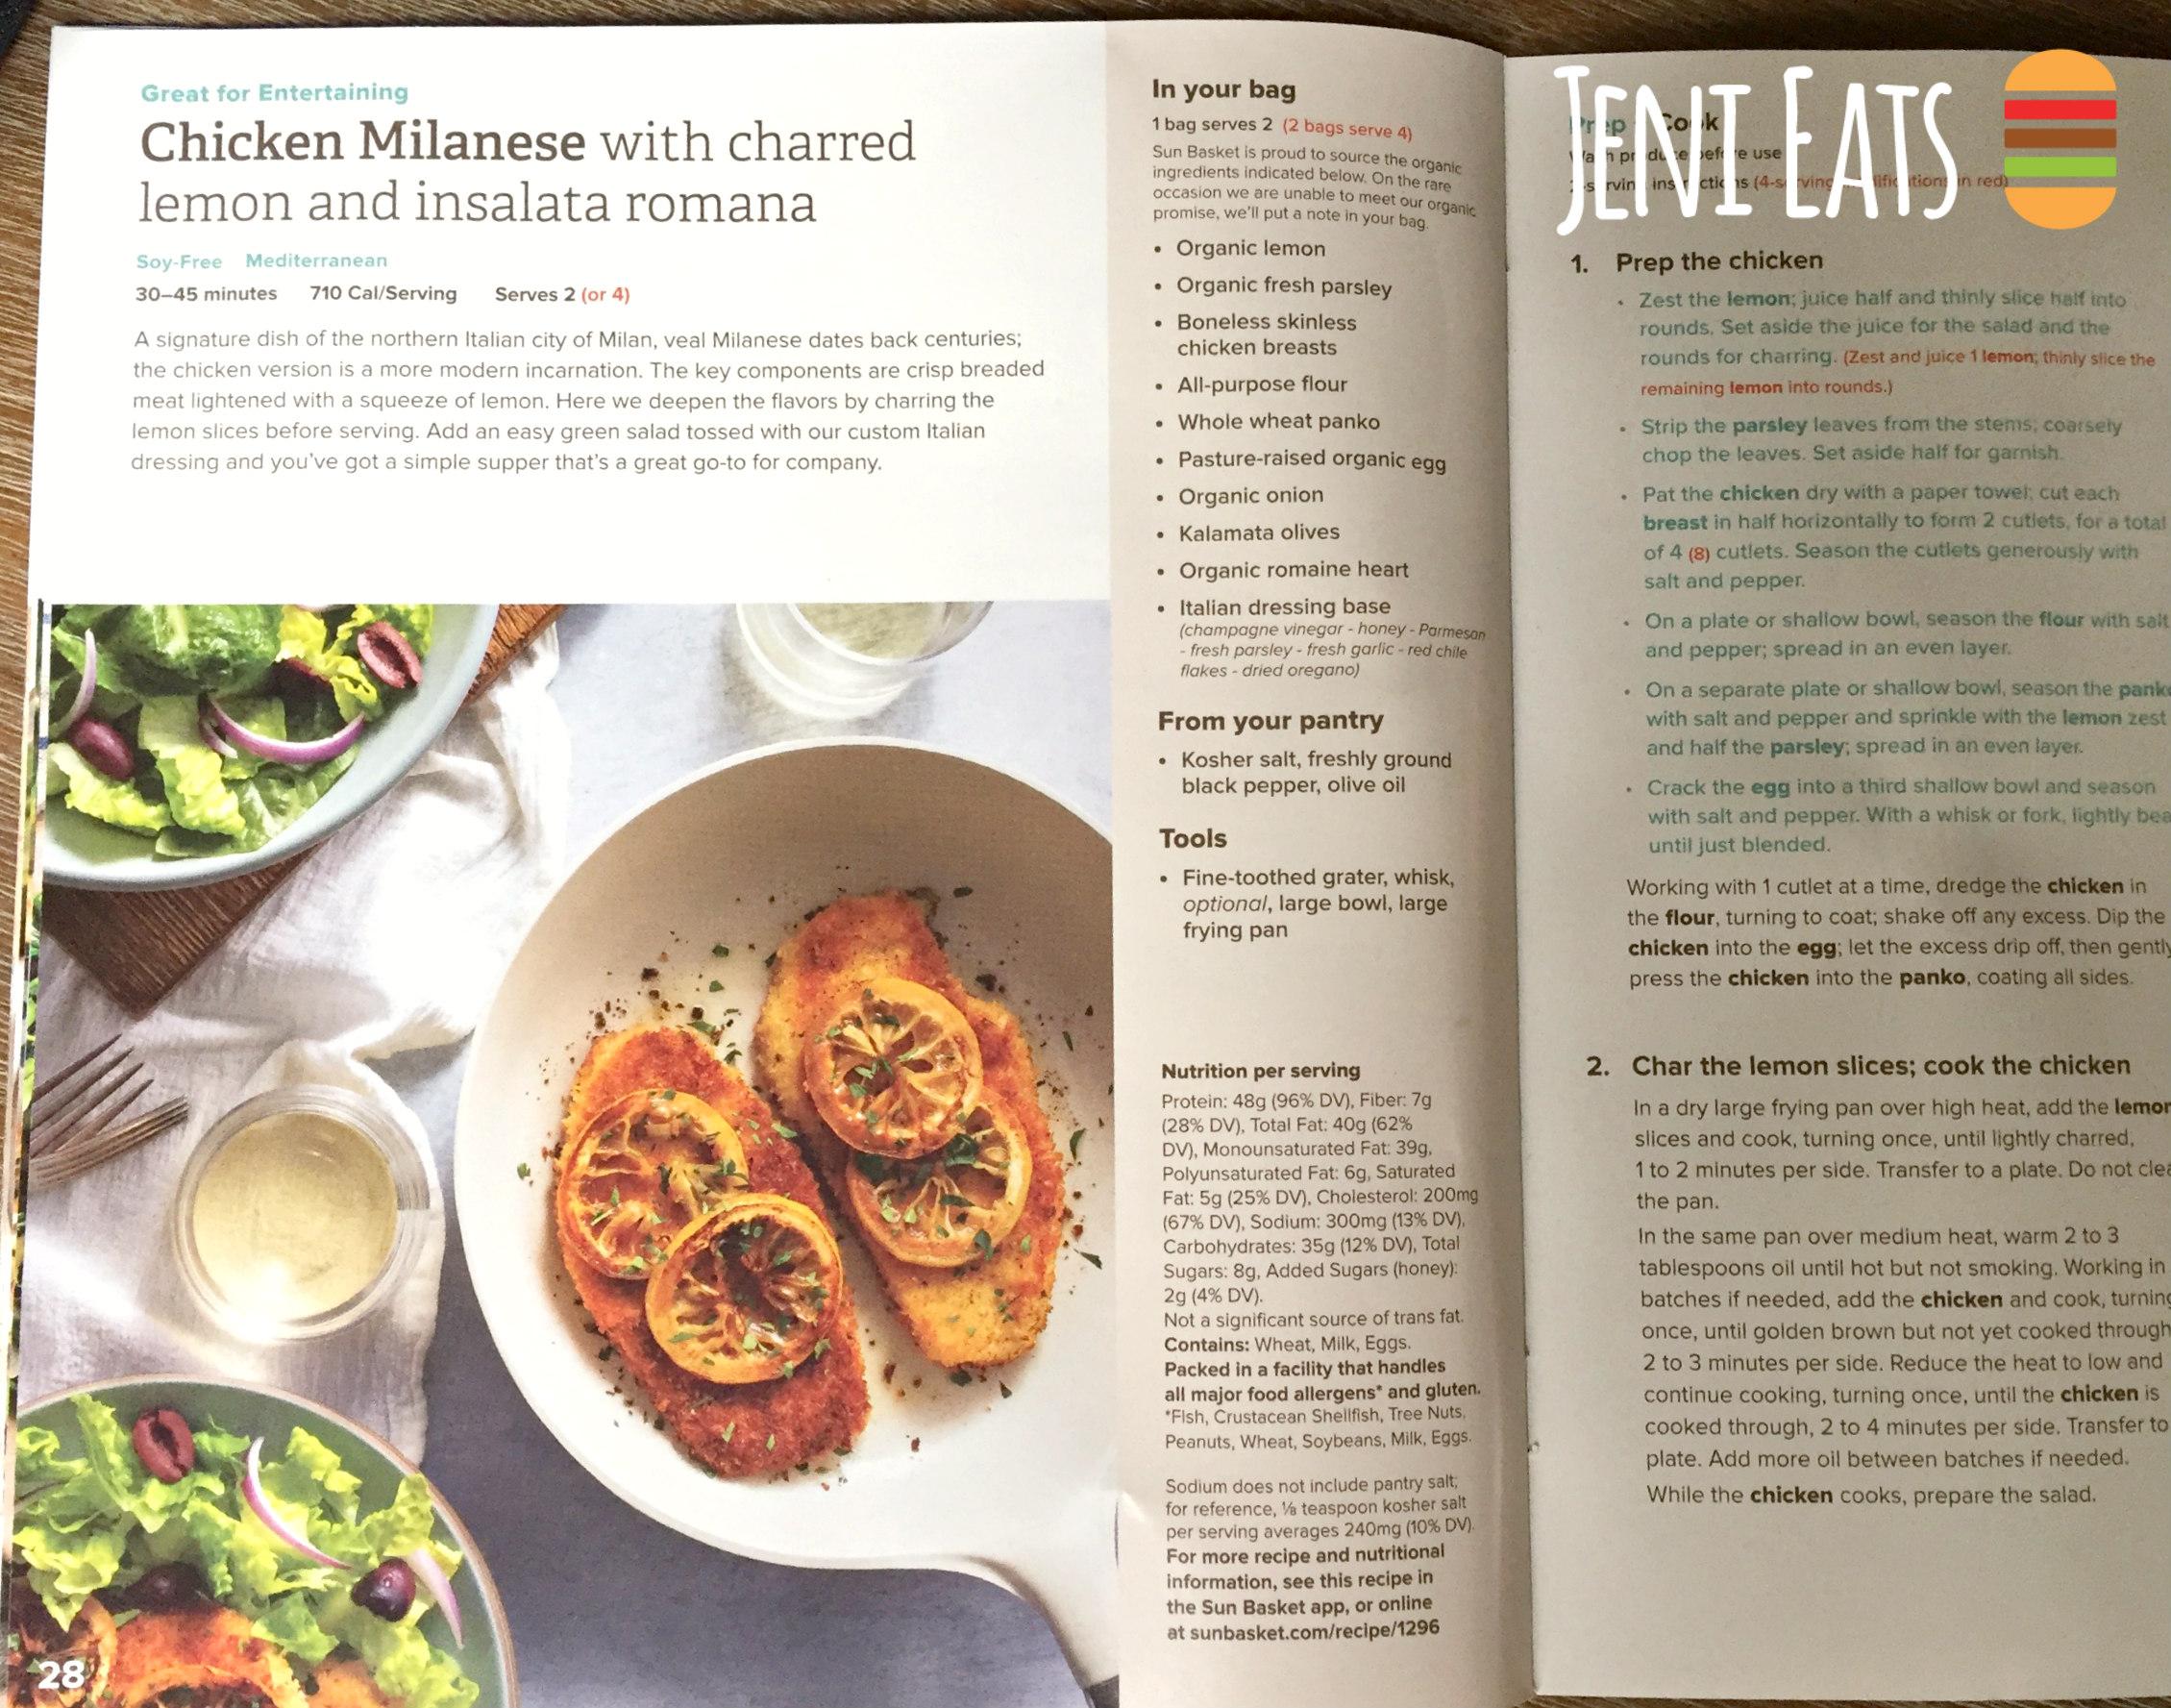 Sun Basket Meal Kit Subscription Box Review: Week One - Jeni Eats